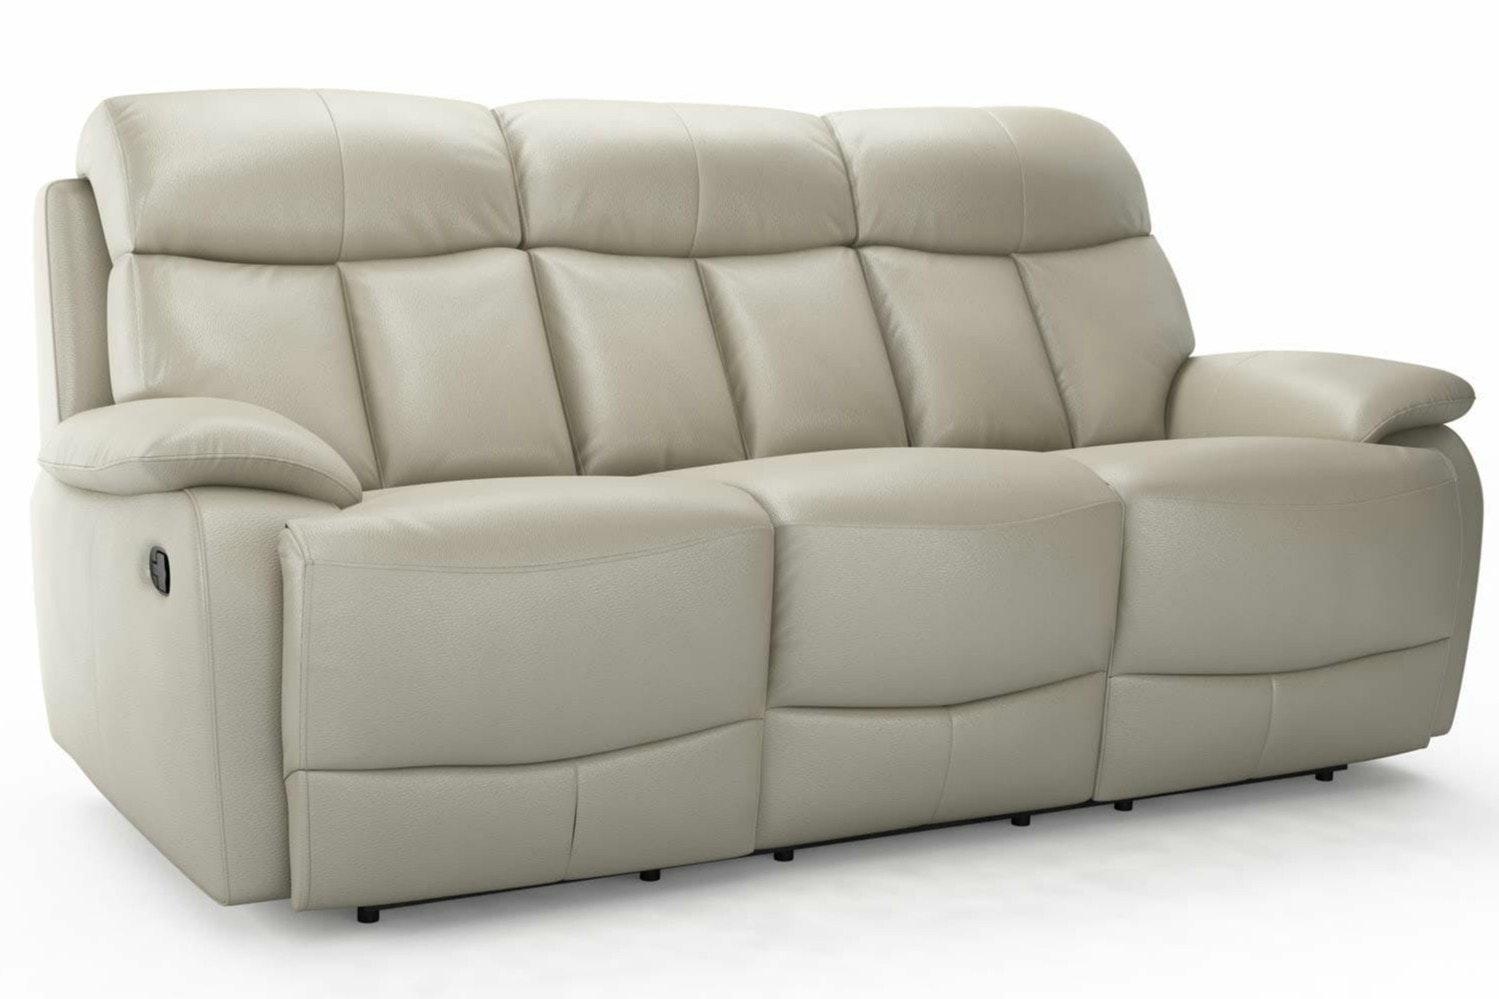 Seline 3 Seater Leather Recliner Sofa Ireland ~ Three Seater Recliner Sofa